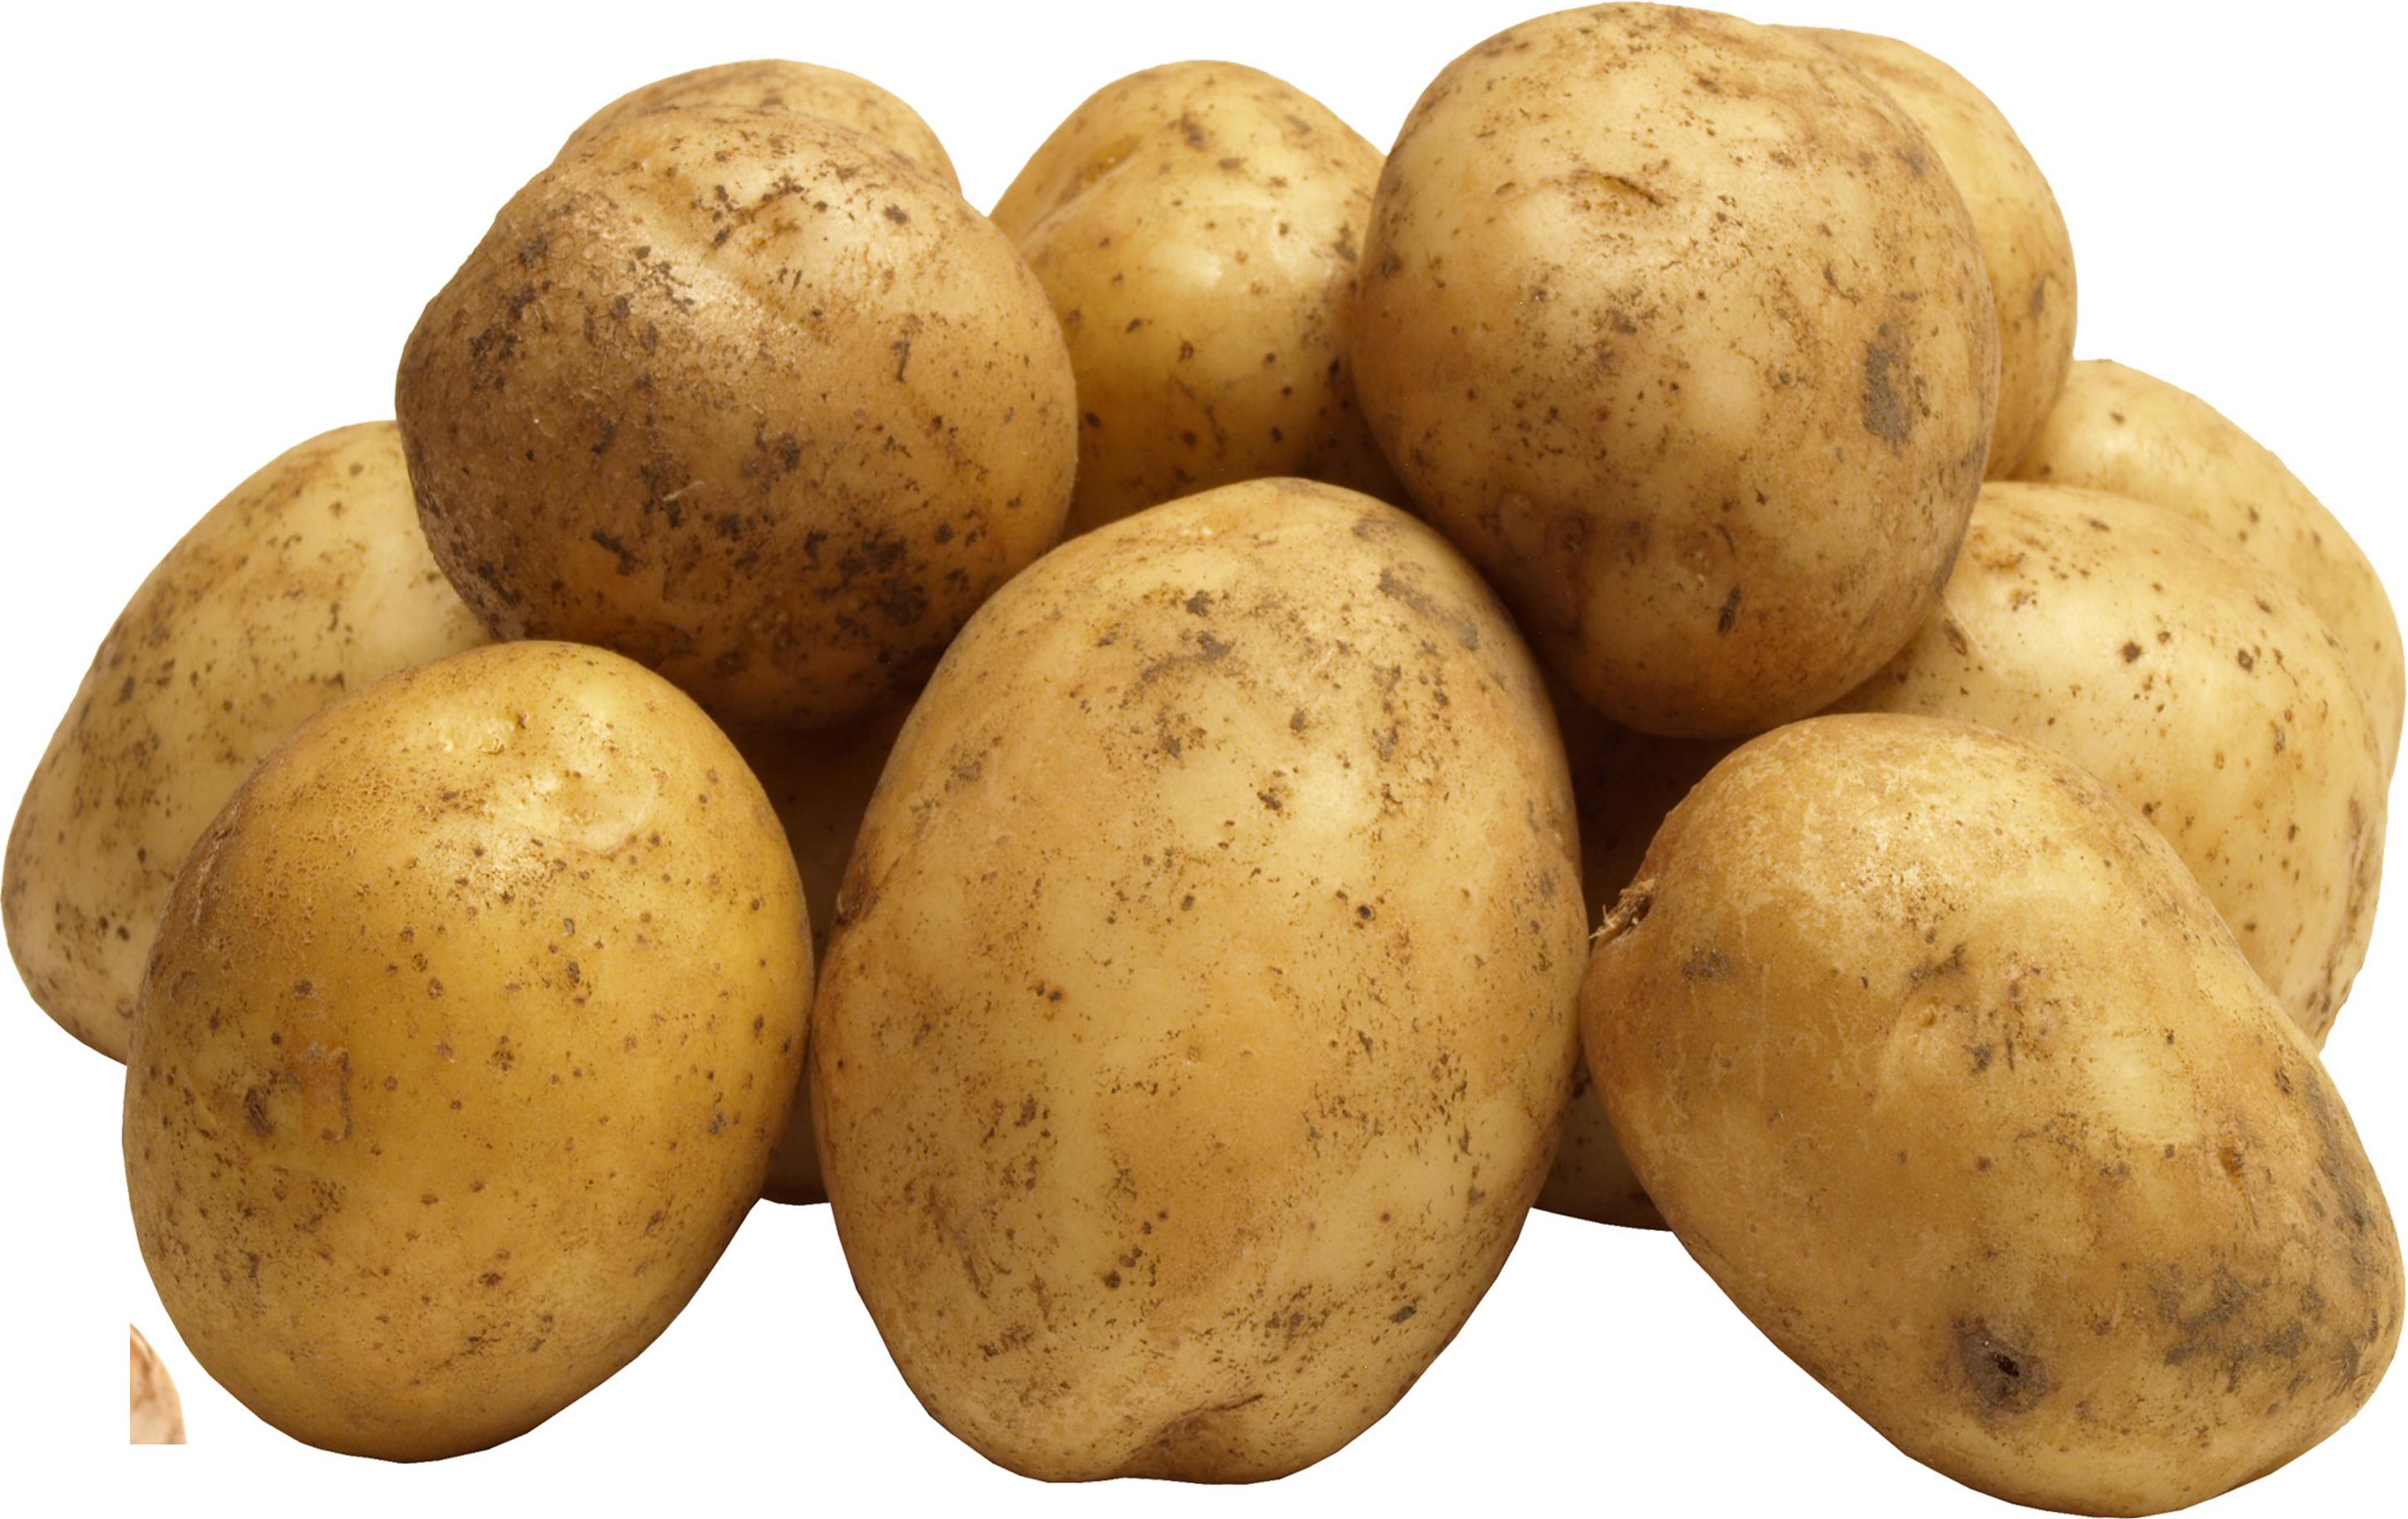 Images of Potato | 2908x1835